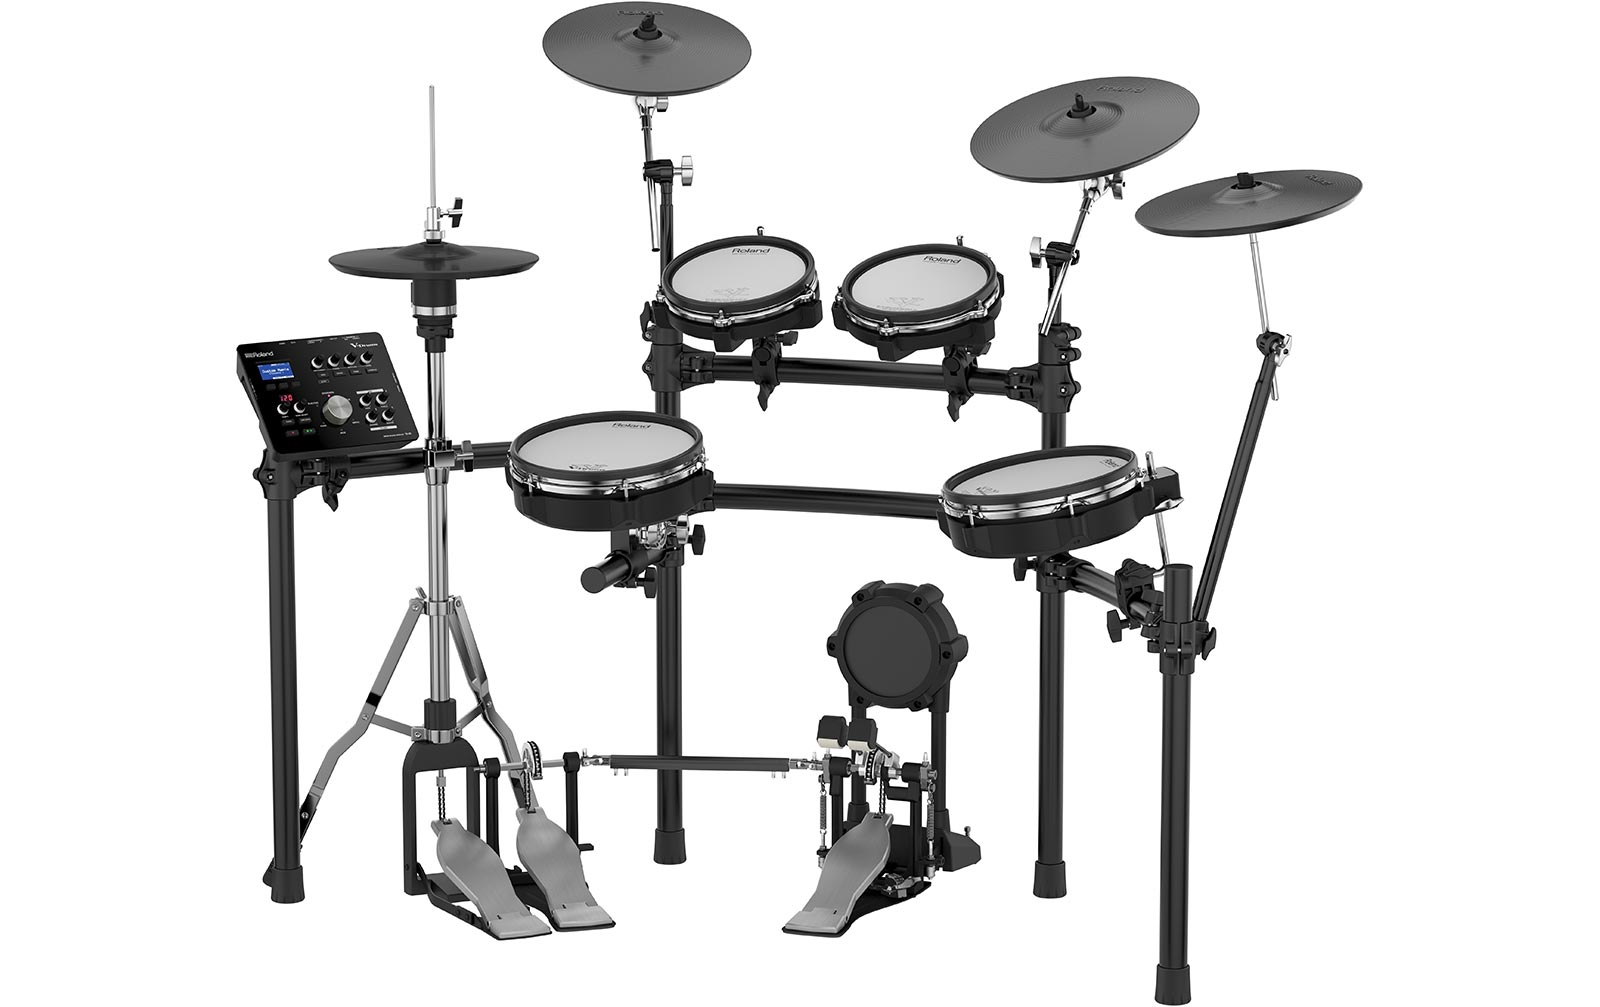 roland-td-25kv-v-drum-set